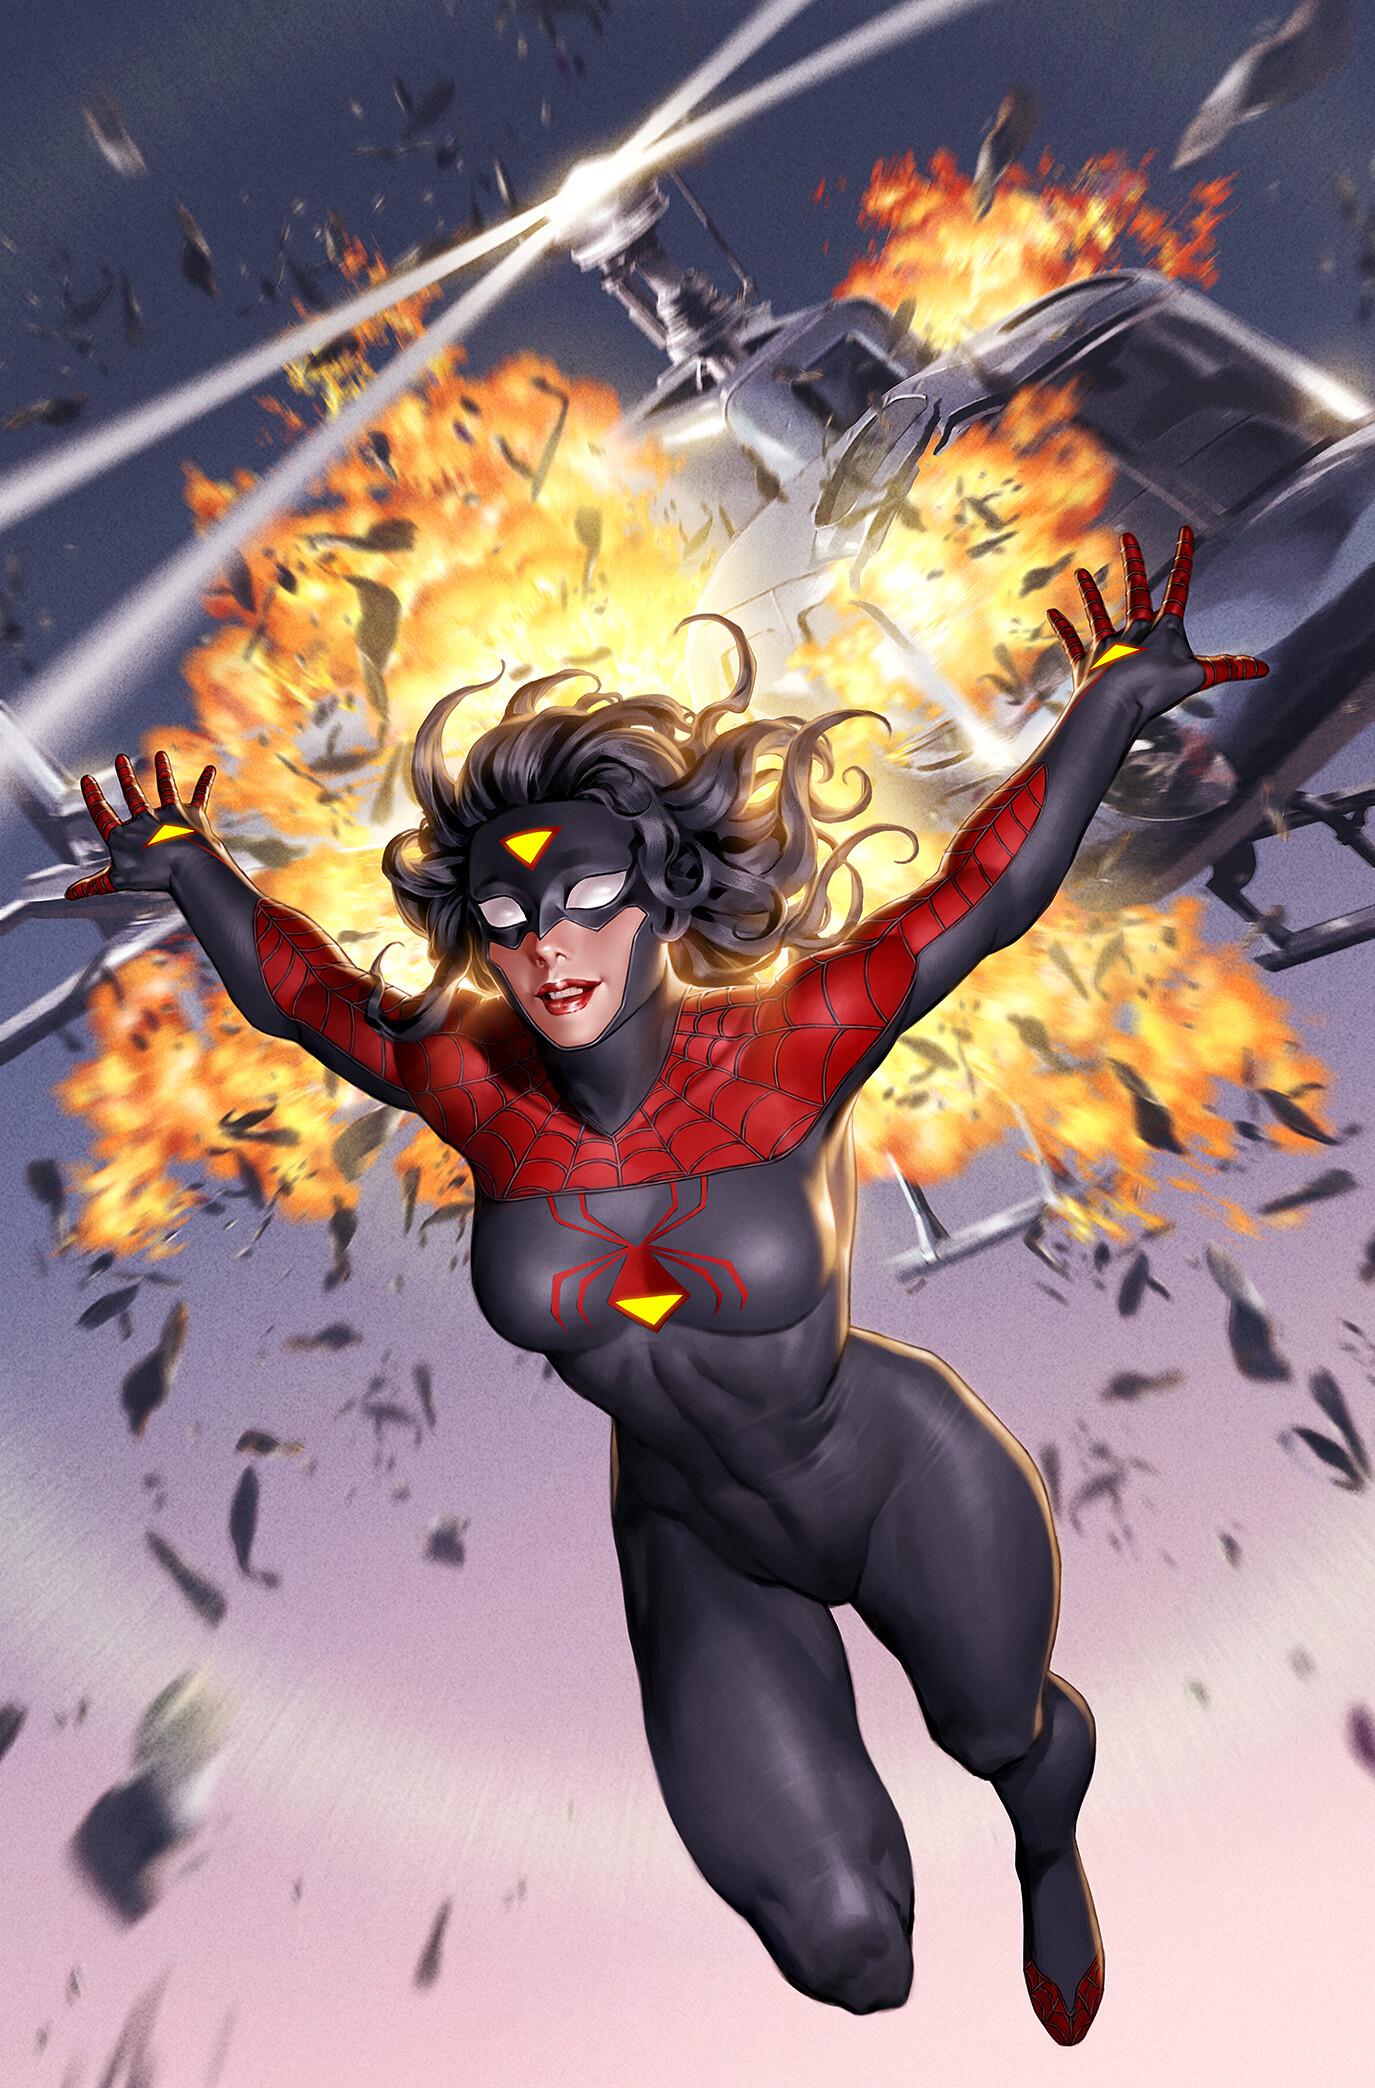 Spider-Woman's Suit